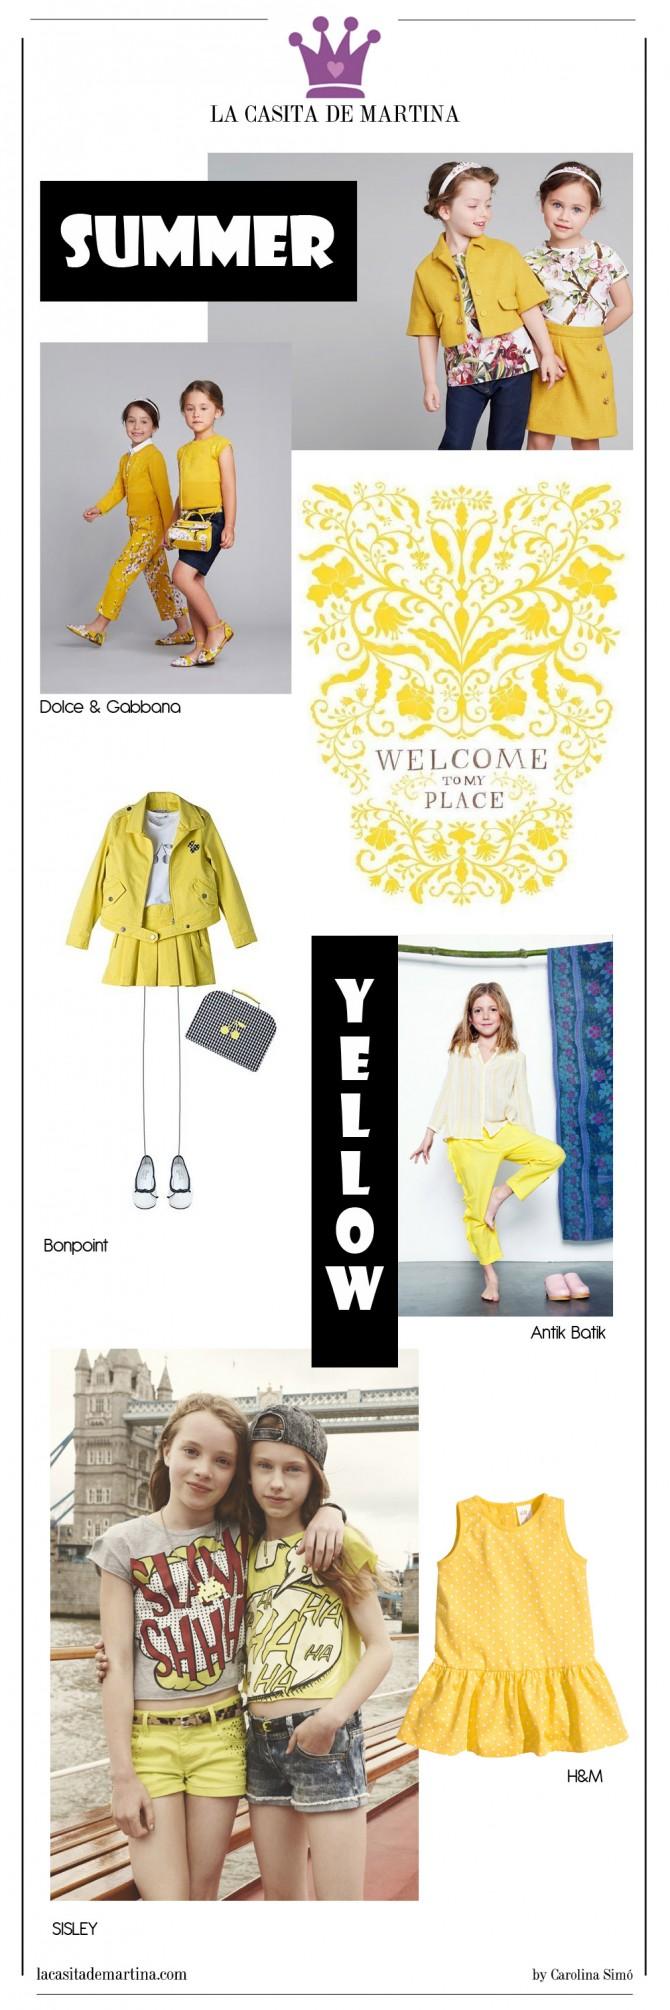 Blog Moda Infantil, La casita de Martina, Dolce & Gabbana, Tendencias Moda Infantil